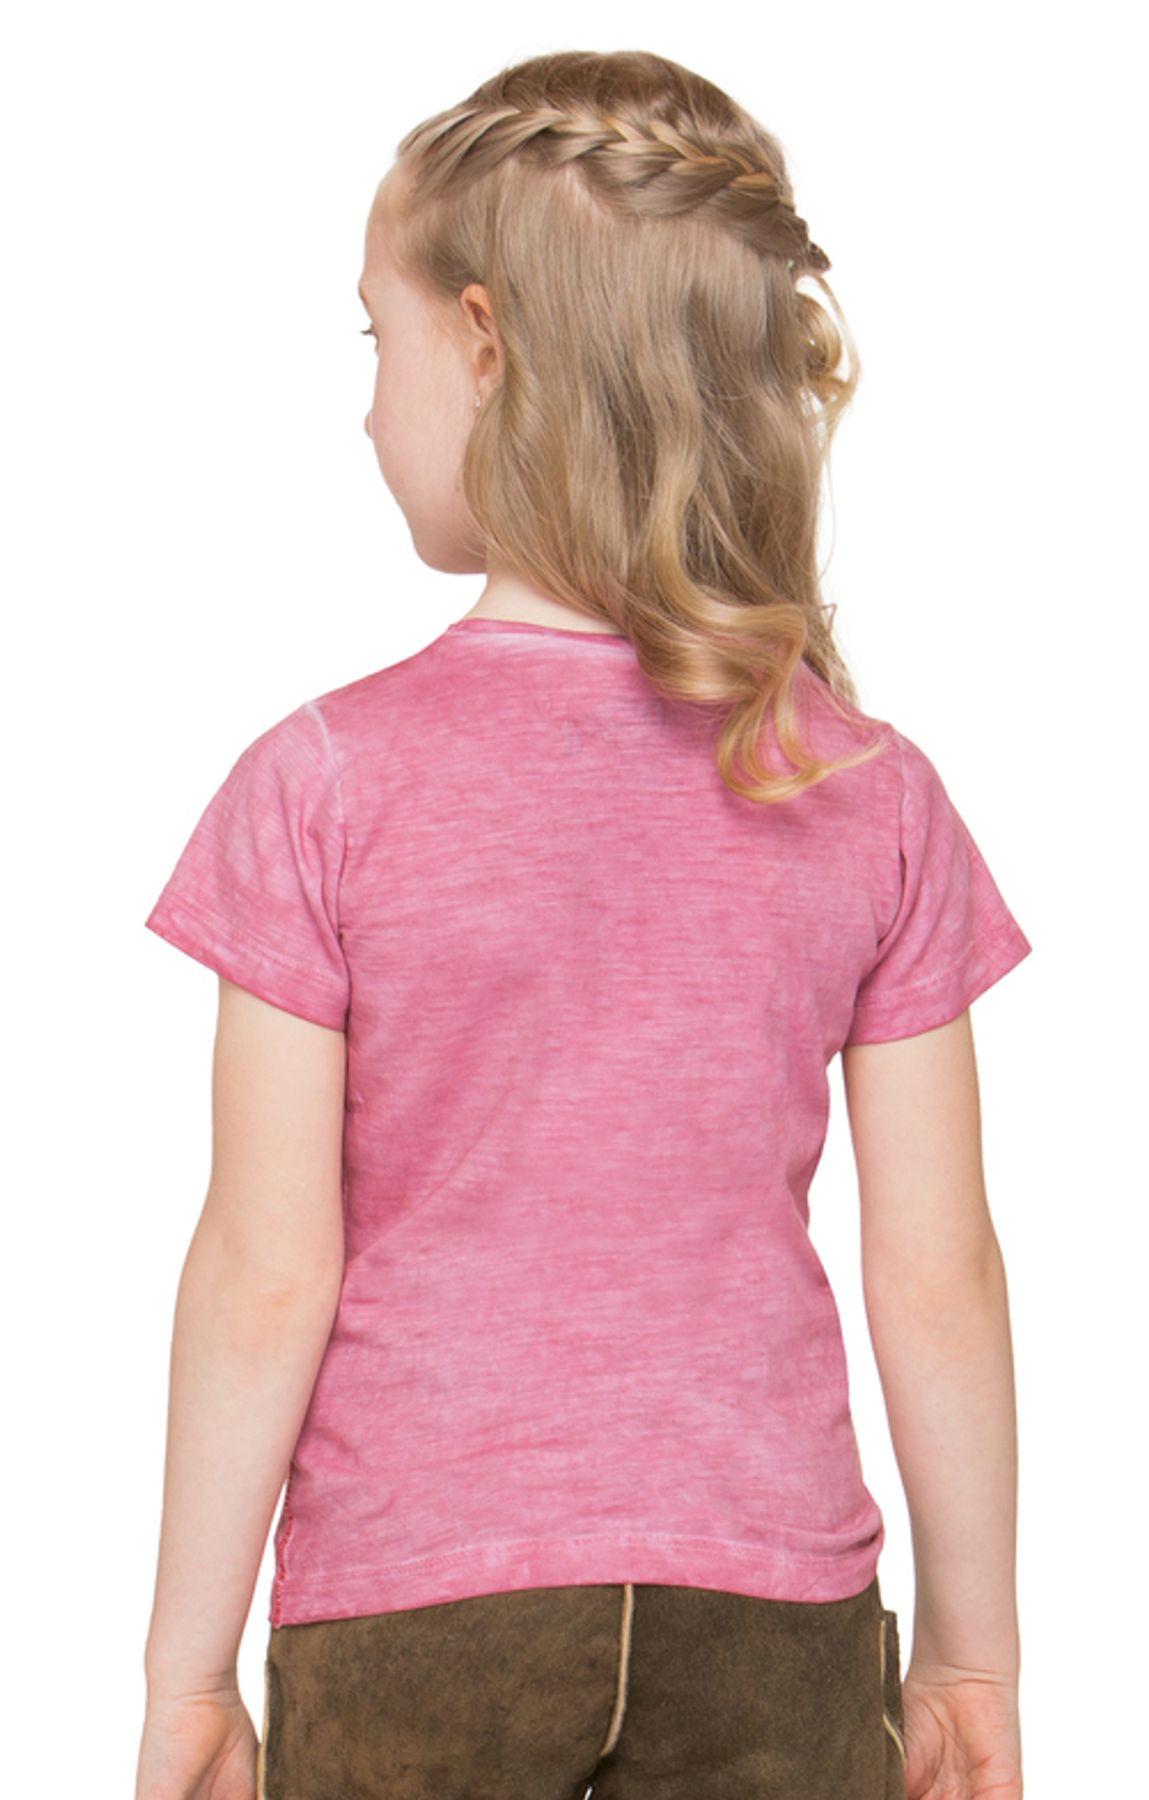 Stockerpoint - Kinder Trachten T-Shirt Wolpigirl, Gr. 86-140 – Bild 3